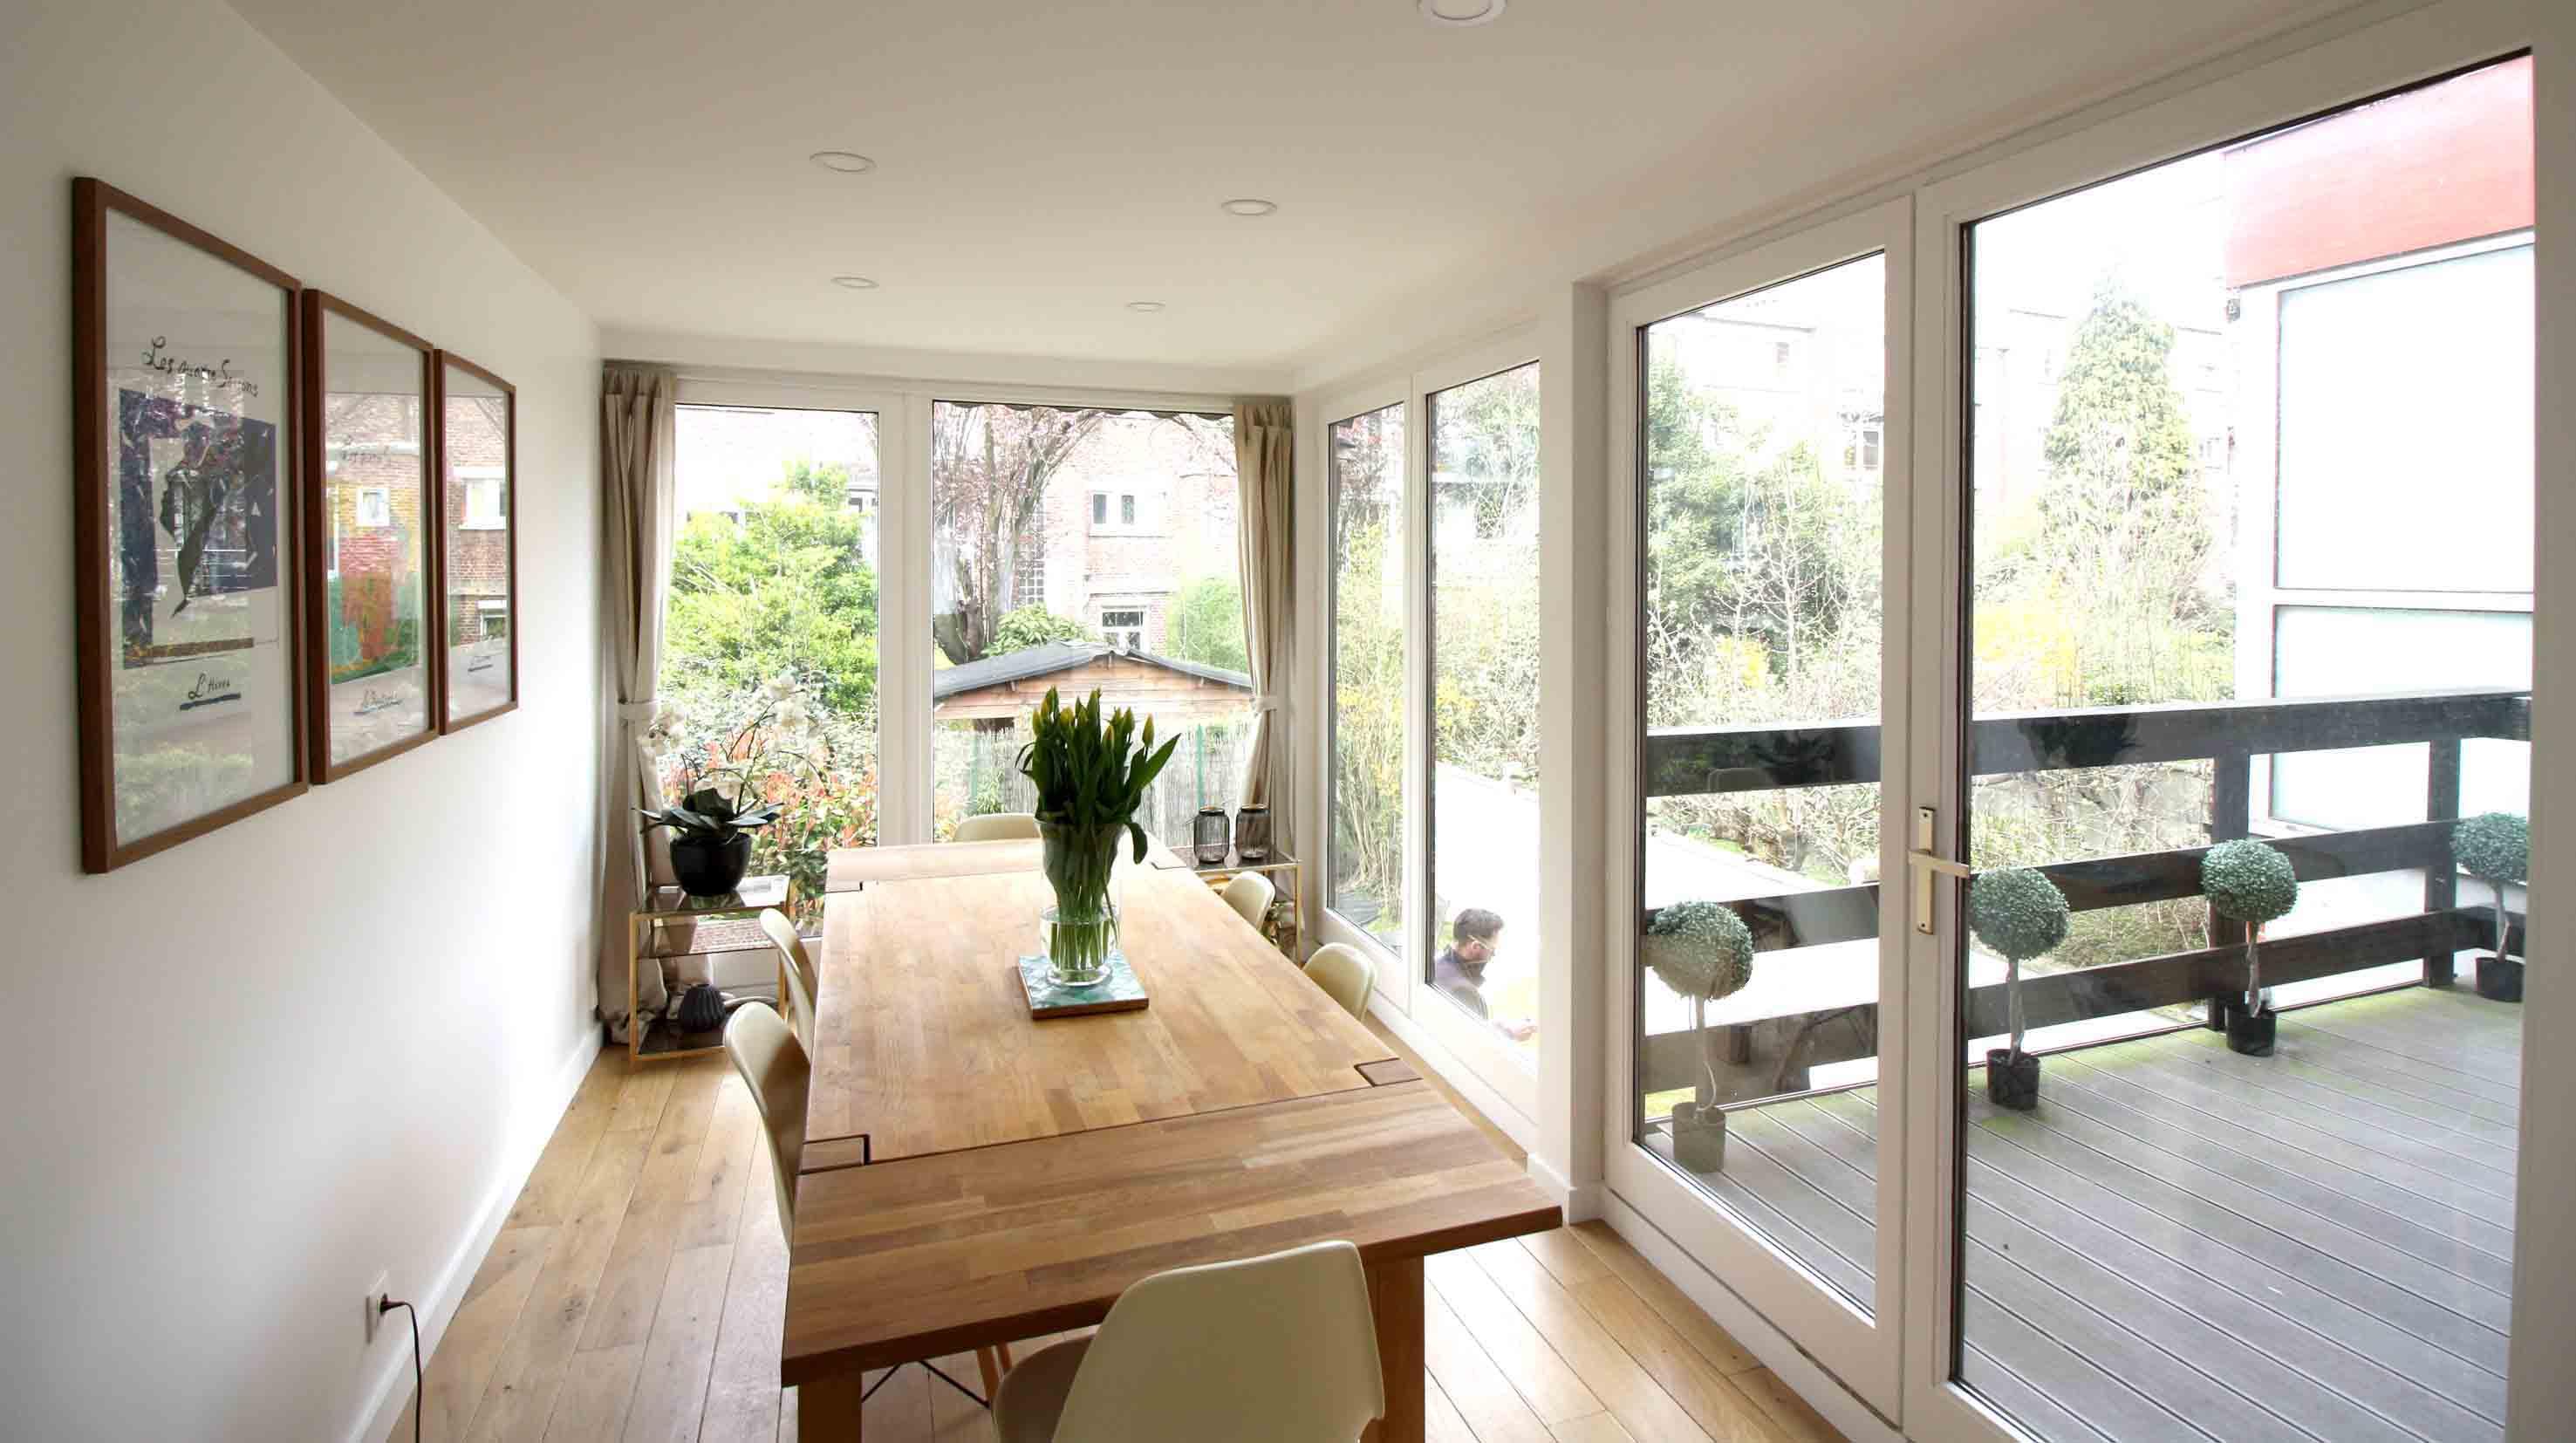 architecte dinterieur lille avis. Black Bedroom Furniture Sets. Home Design Ideas